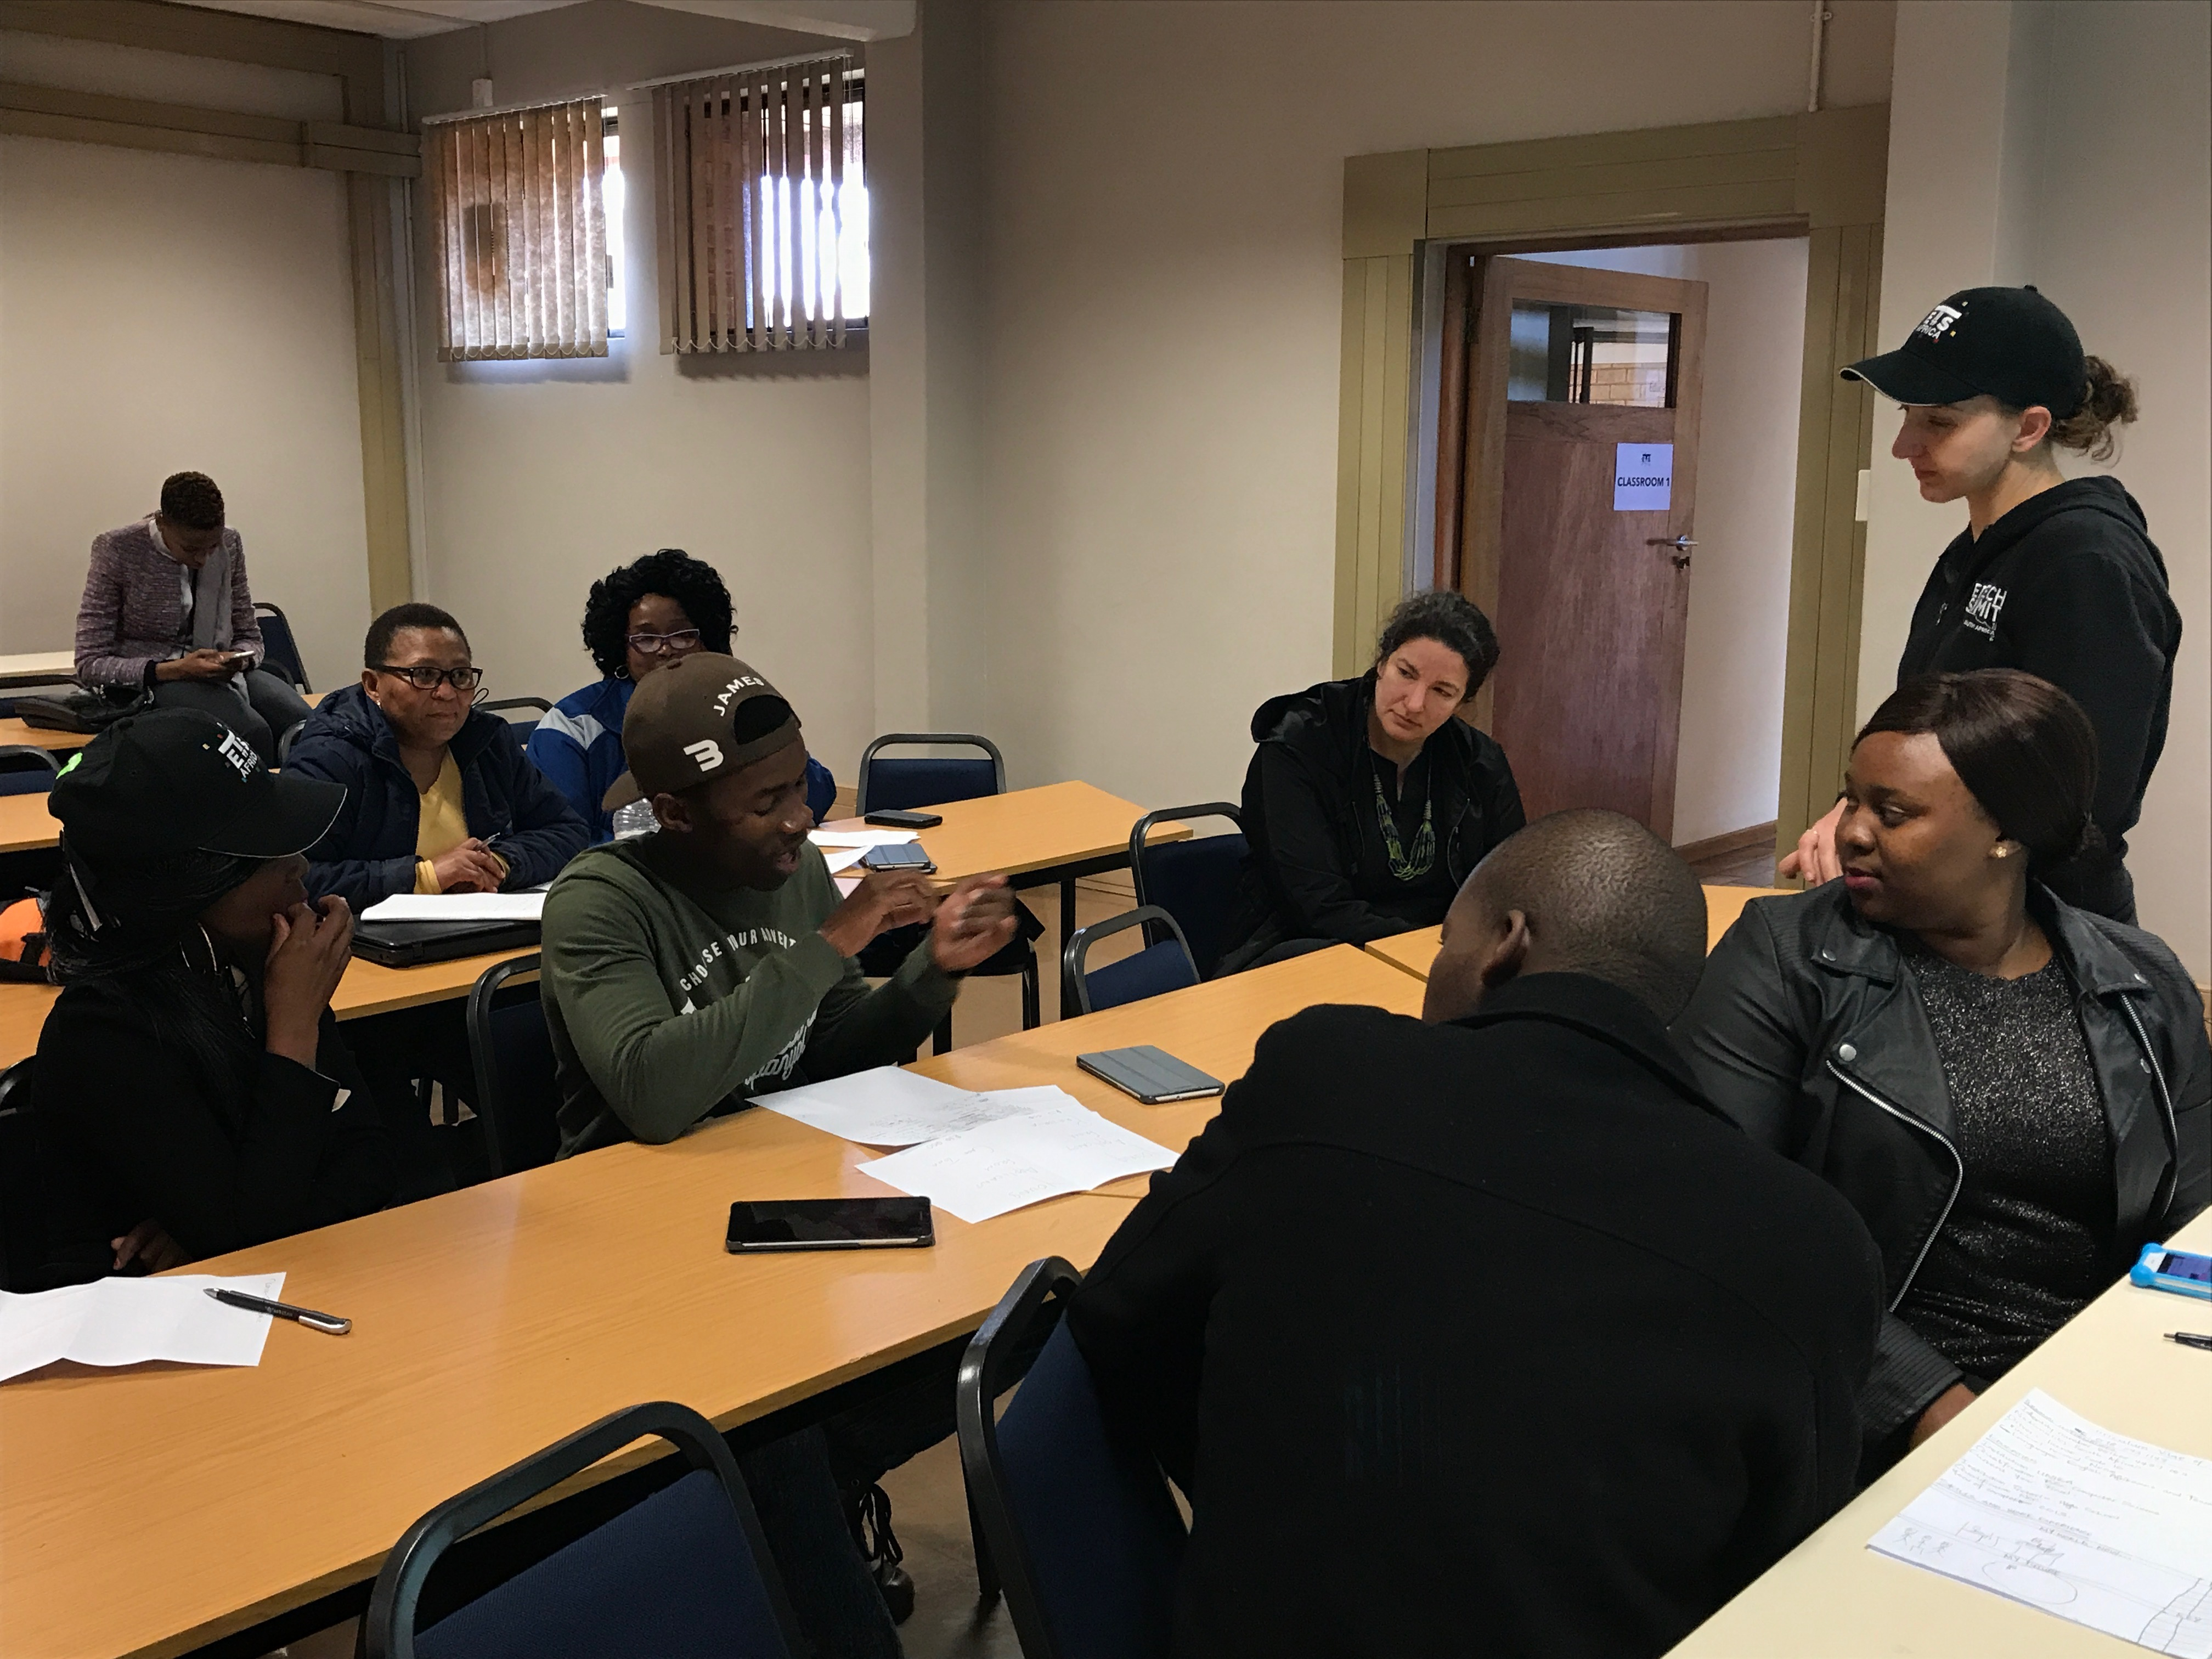 Siobhan leading a workshop at University of Pretoria, Mamelodi campus